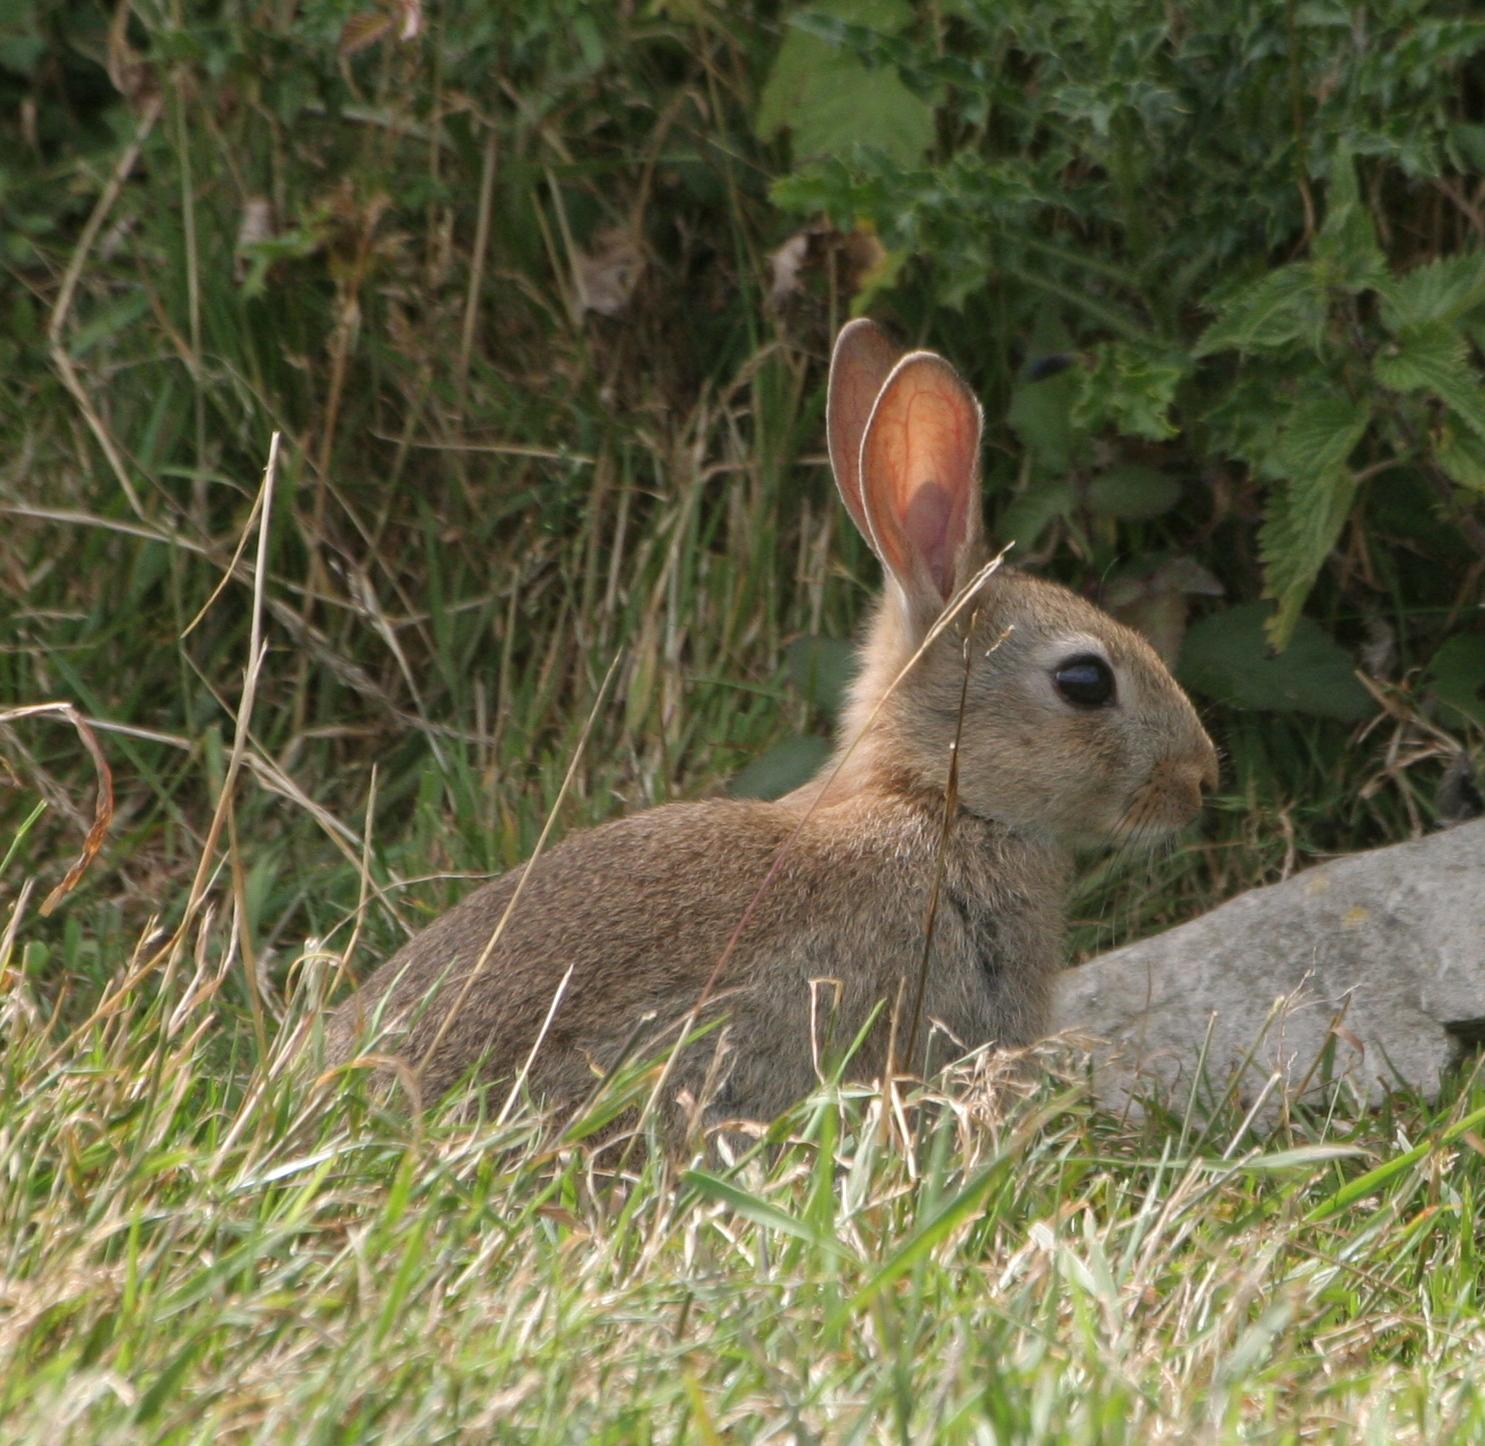 Wild rabbit images  Funny Animal